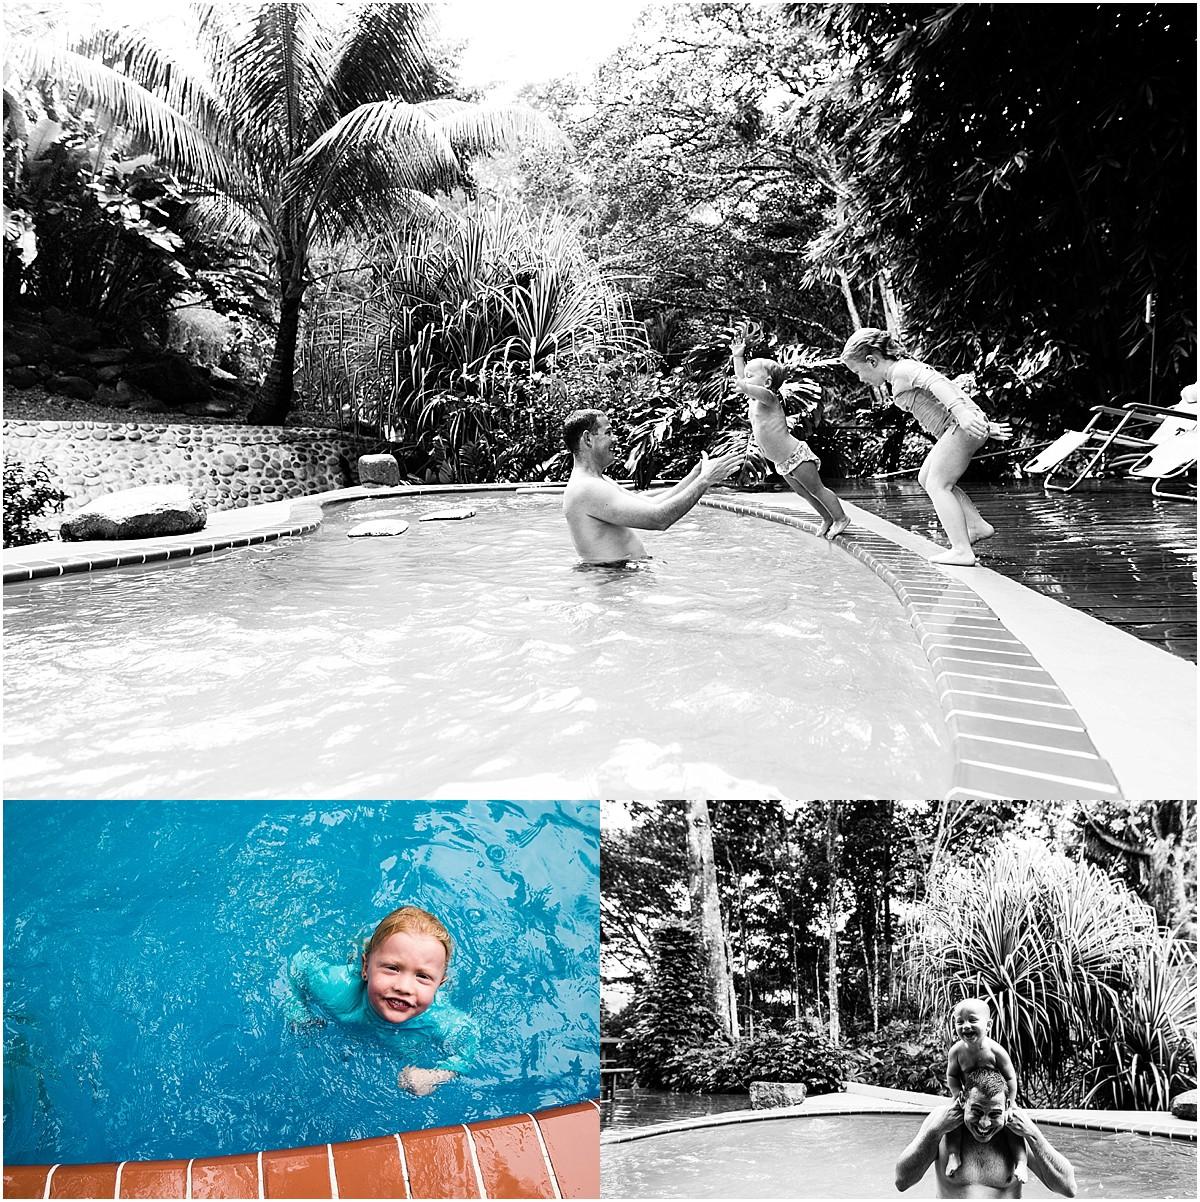 Ashley_Rogers_Photography_South_Florida_Photographer_Orlando_Photographer_Costa_Rica_Photographer_1207.jpg